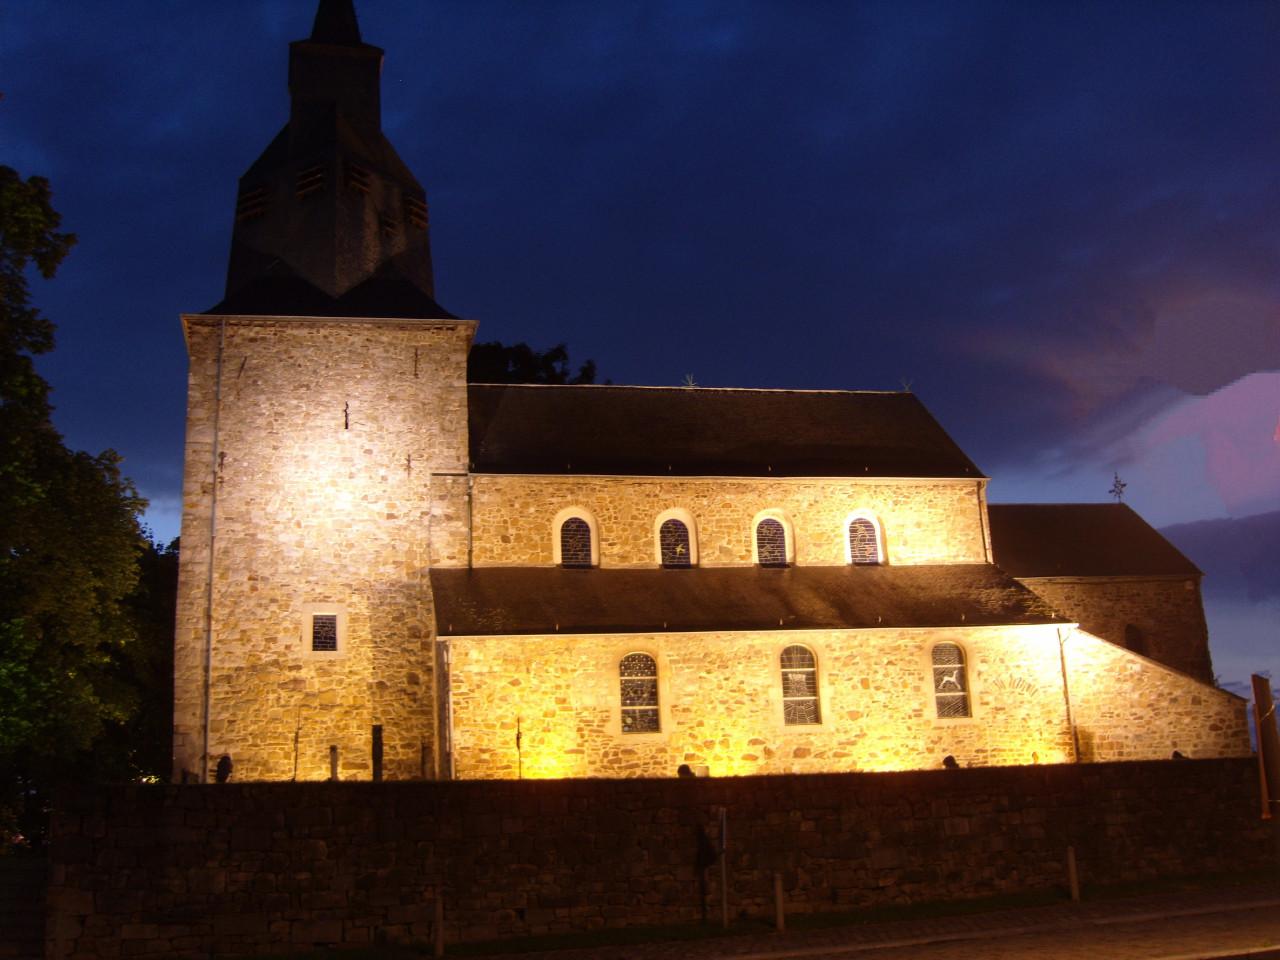 Eglise Romane de Waha